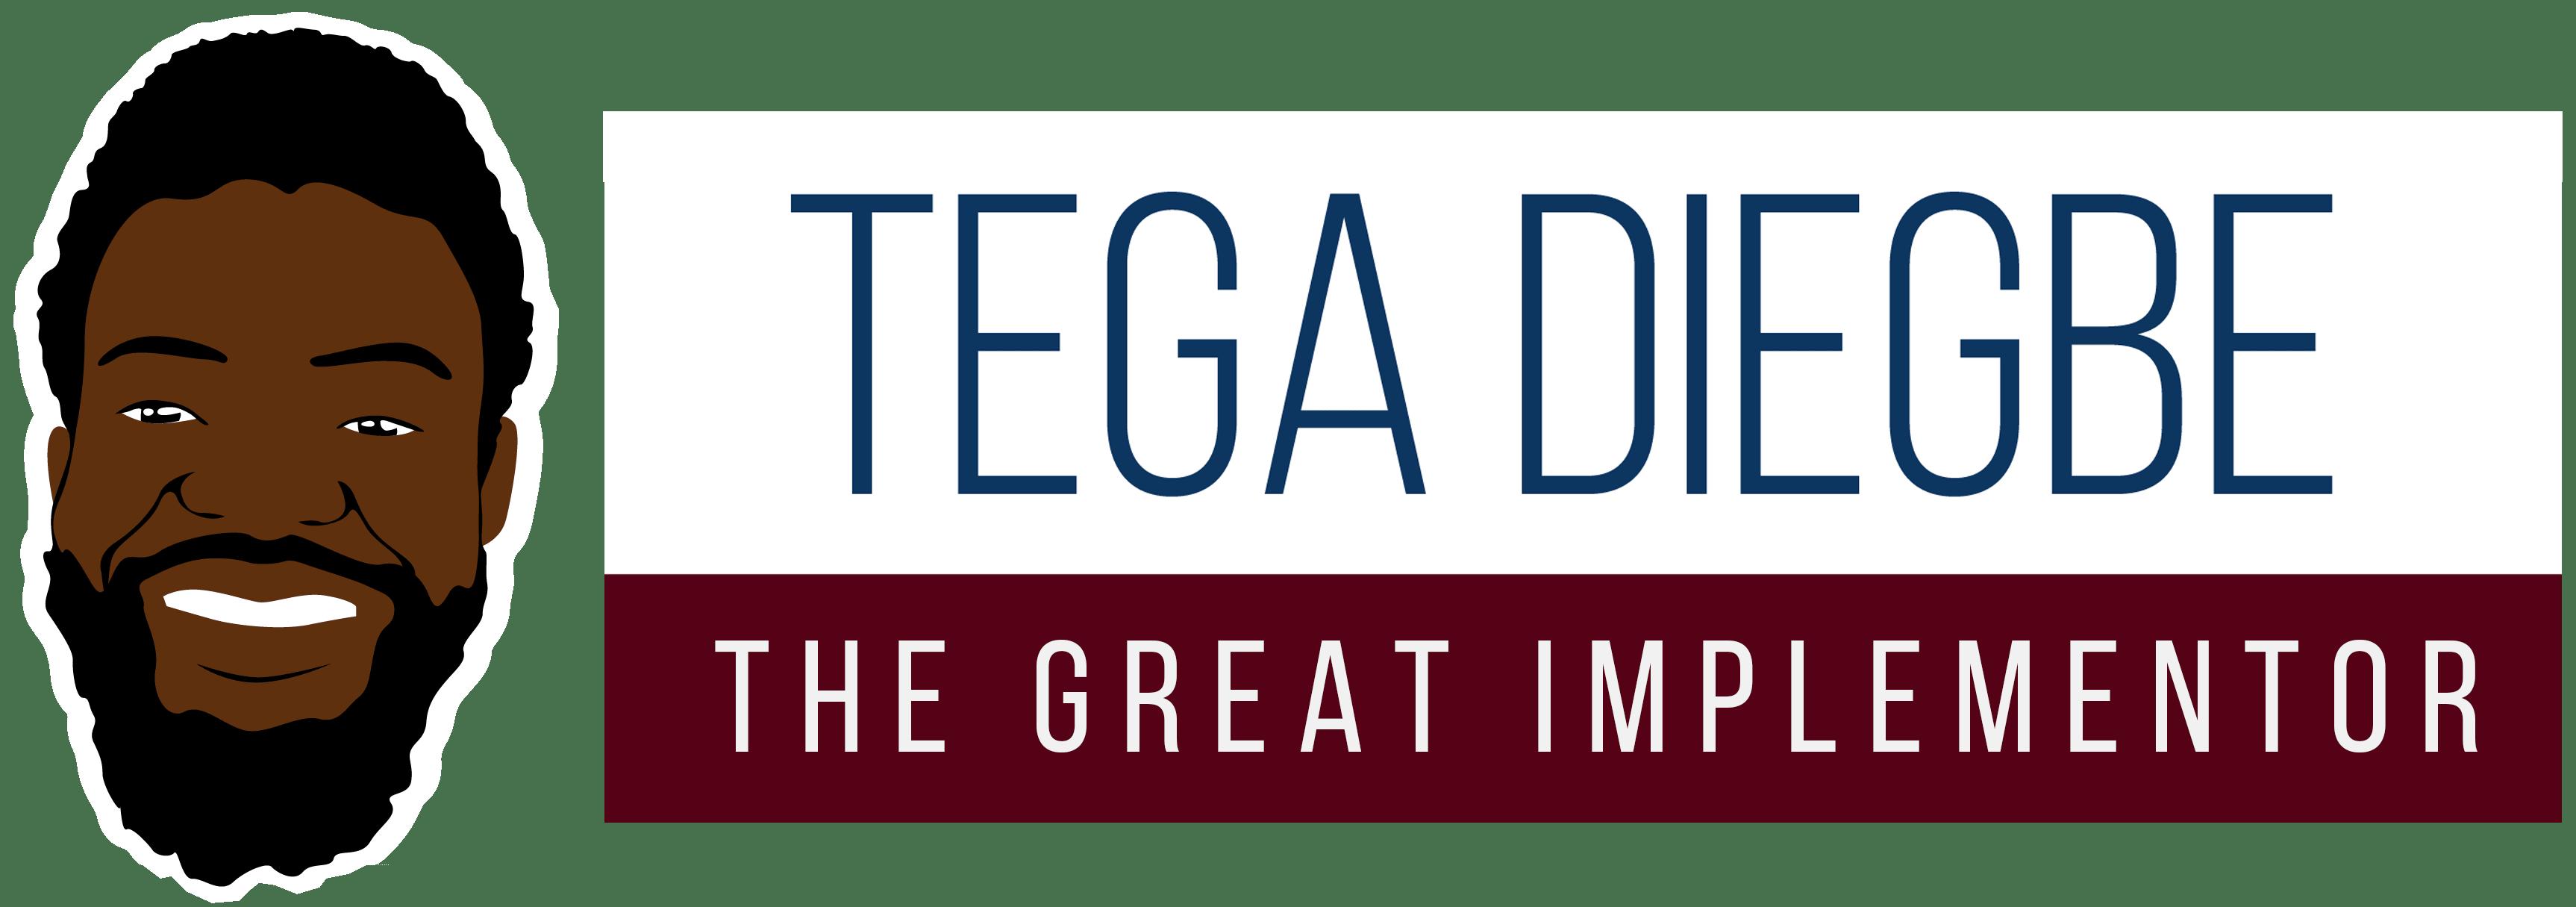 Tegadiegbe.com